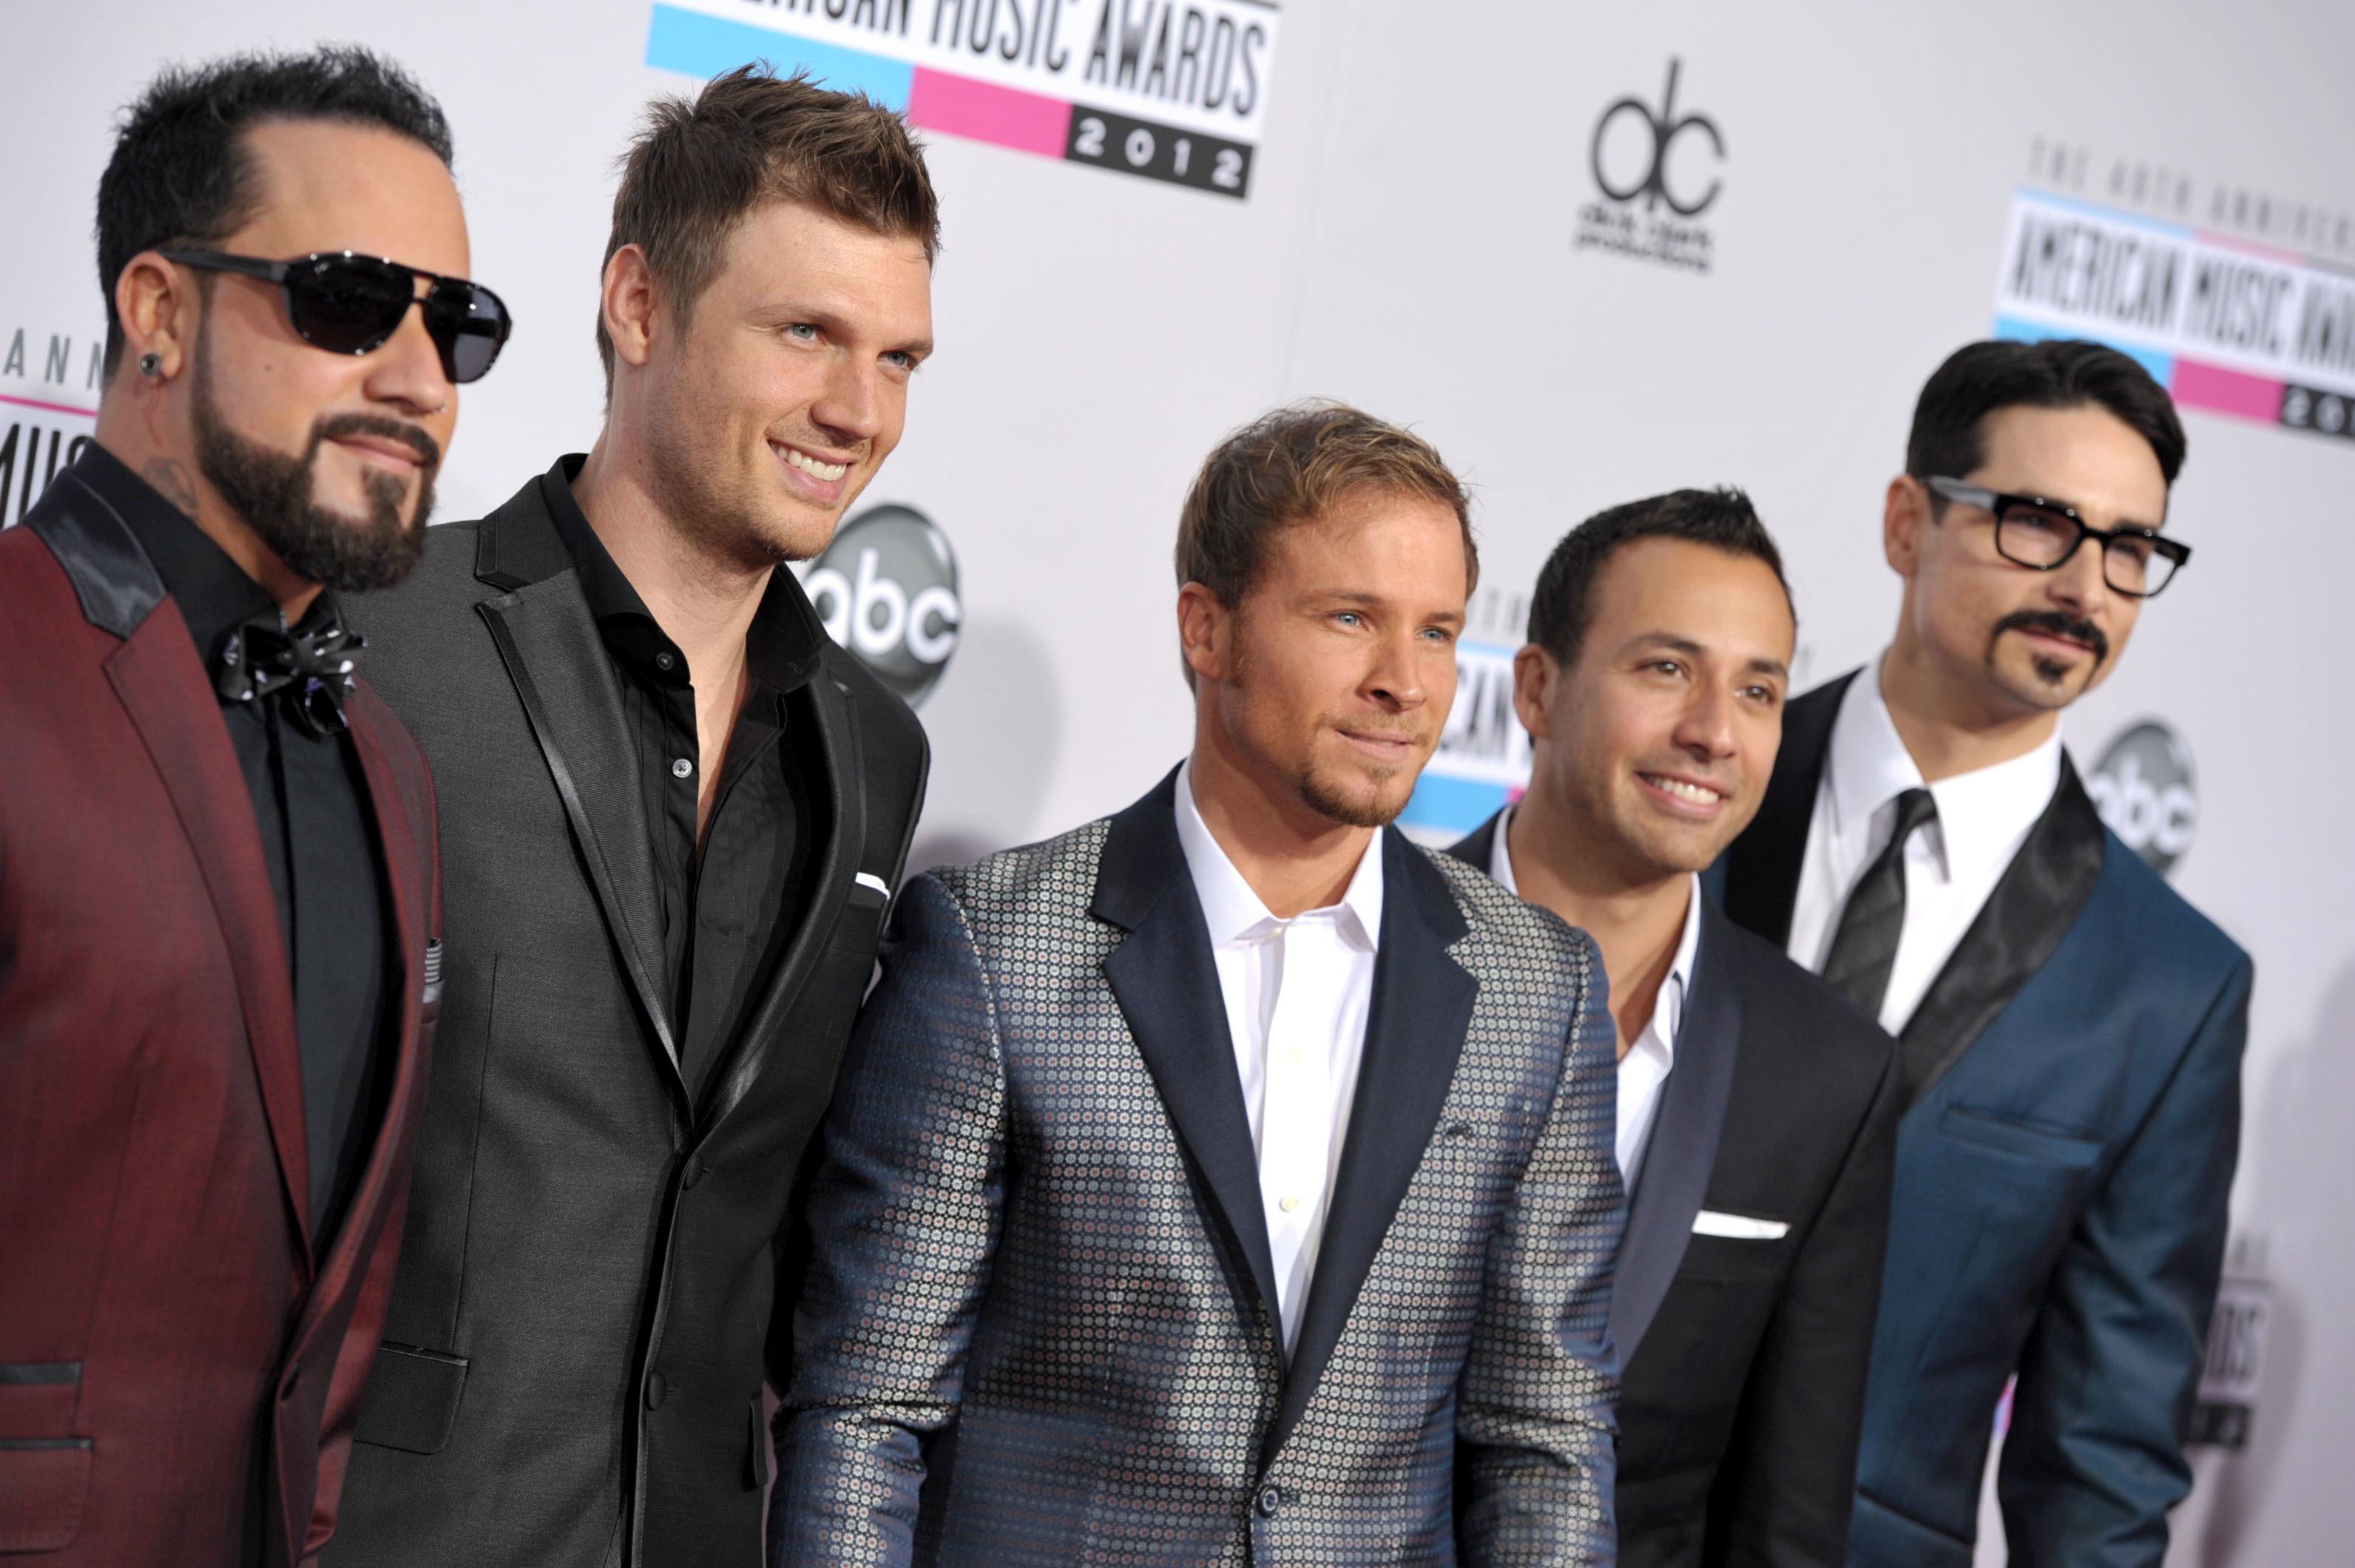 backstreet boys boy band pop music tour album nick carter kevin richardson